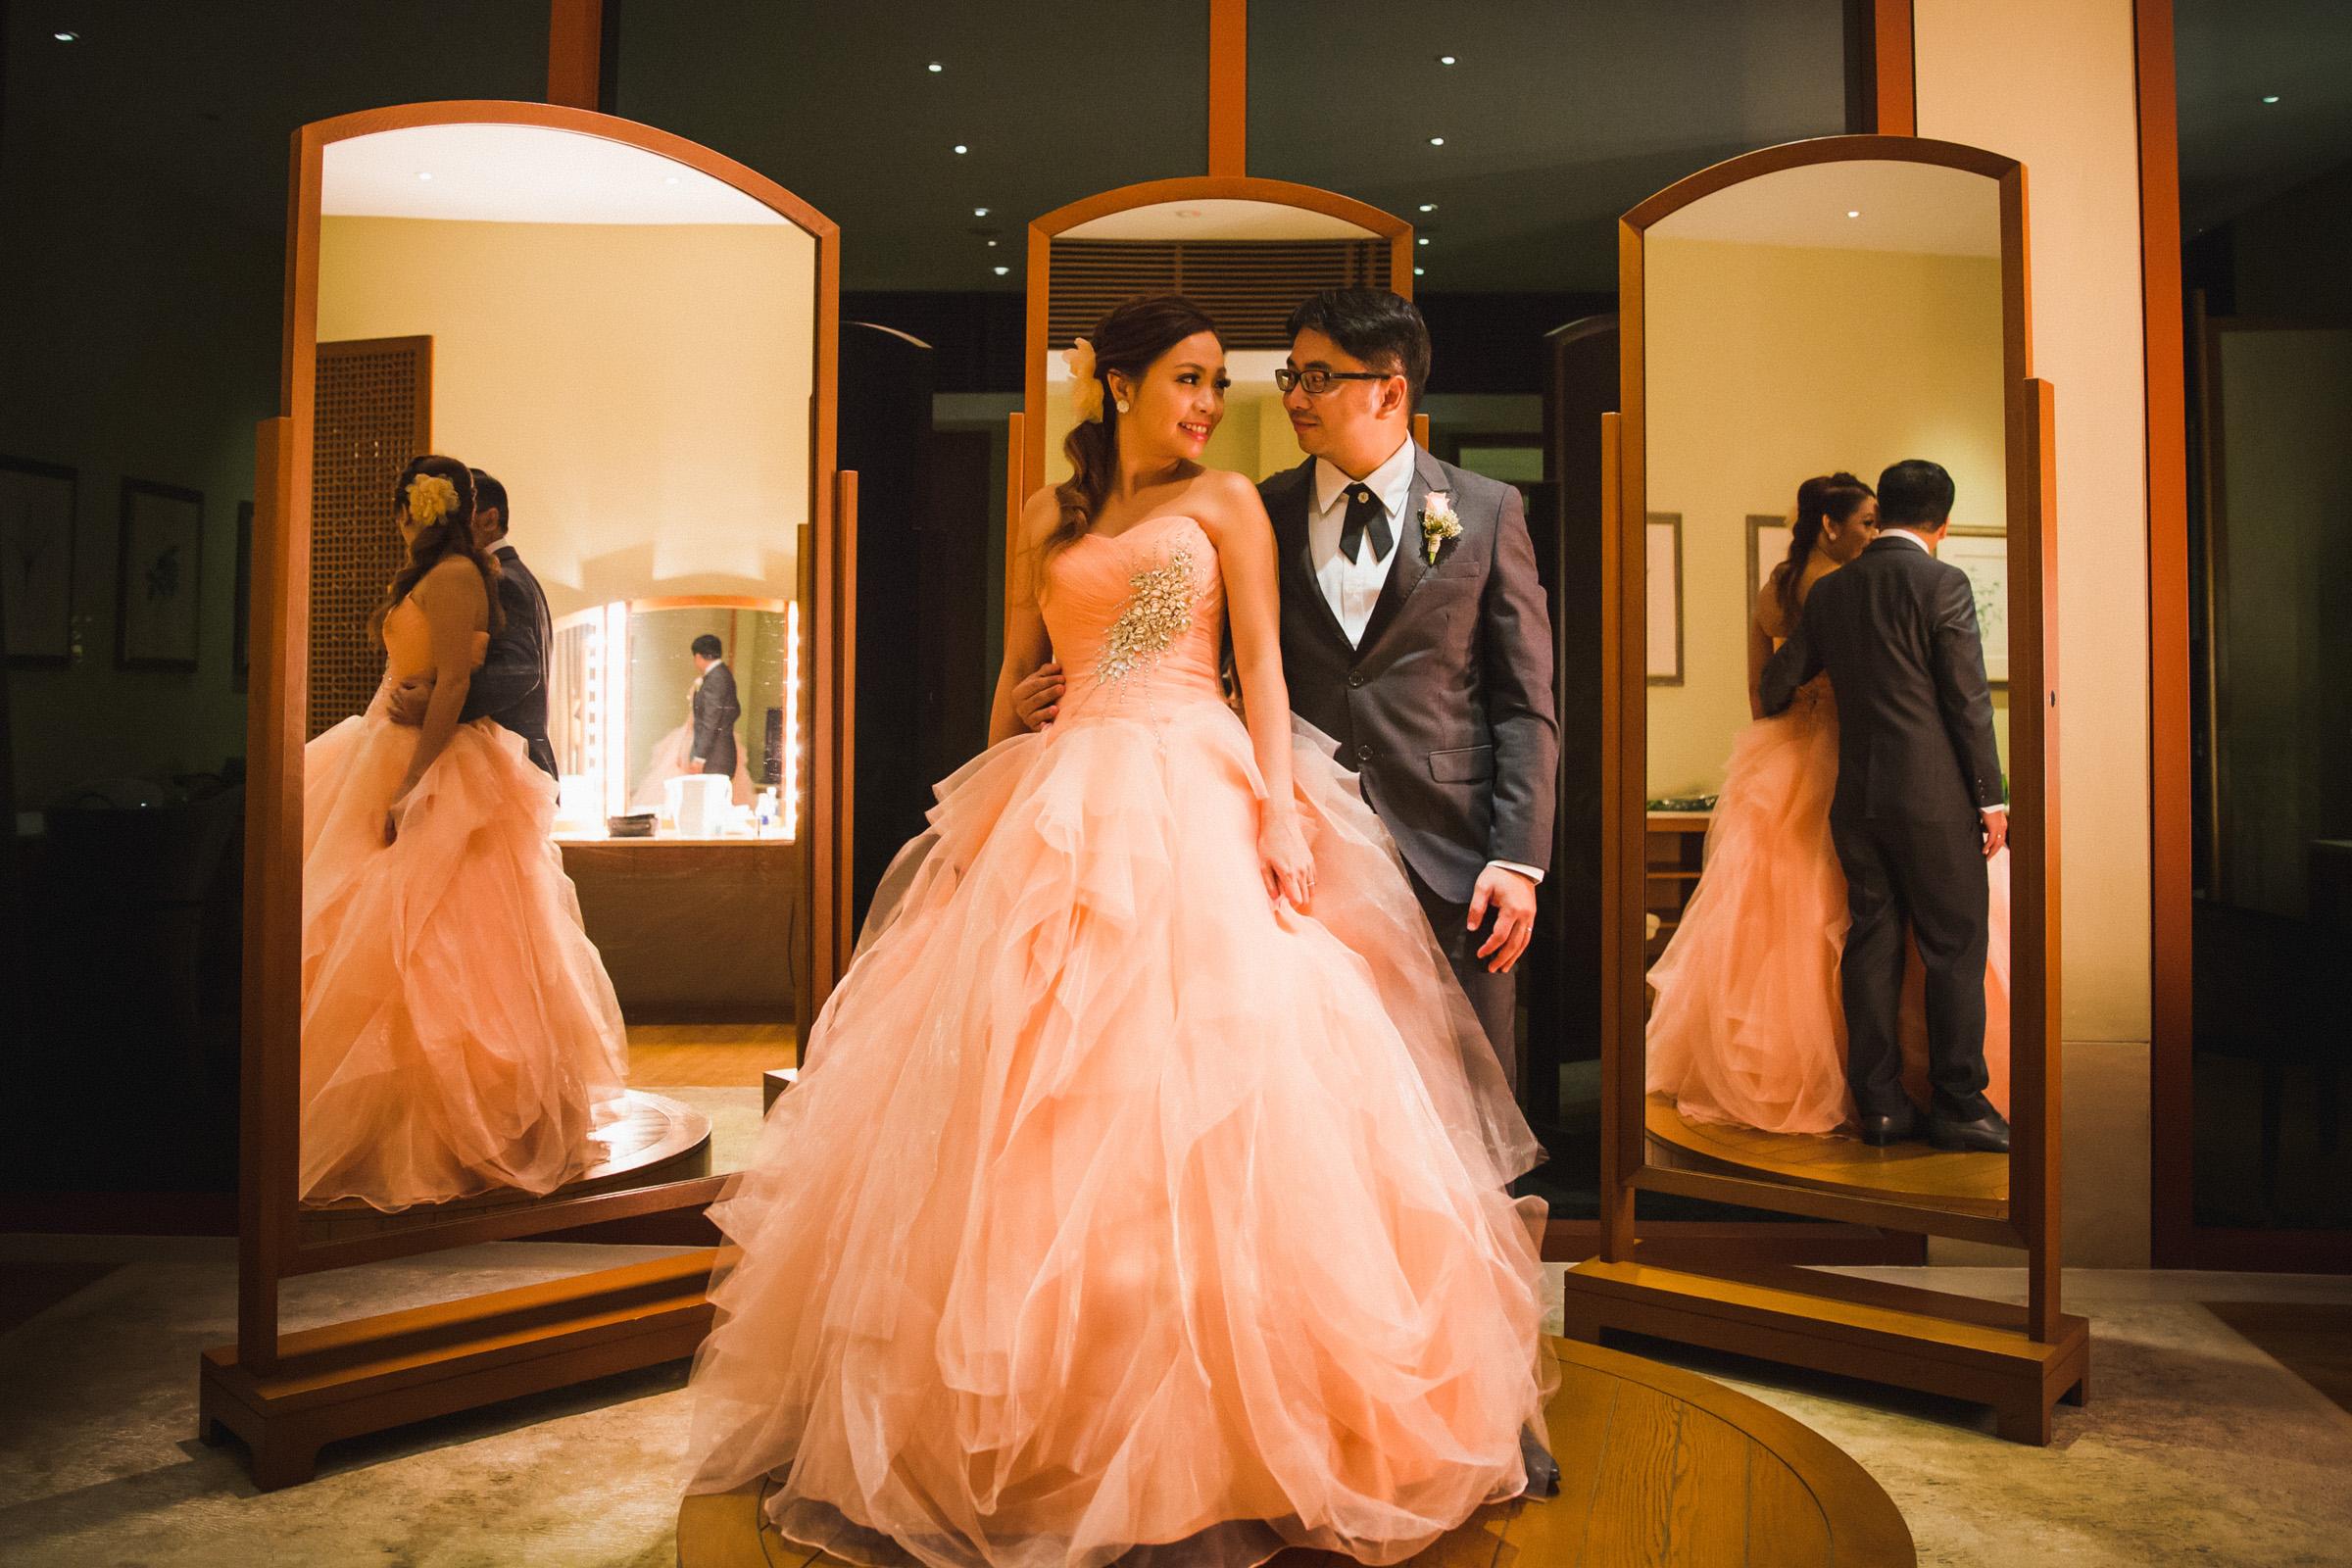 Steven_Jasmine_Wedding_Walldrobe Photography_Wedding shoots_Actual day wedding_Photographer (1)